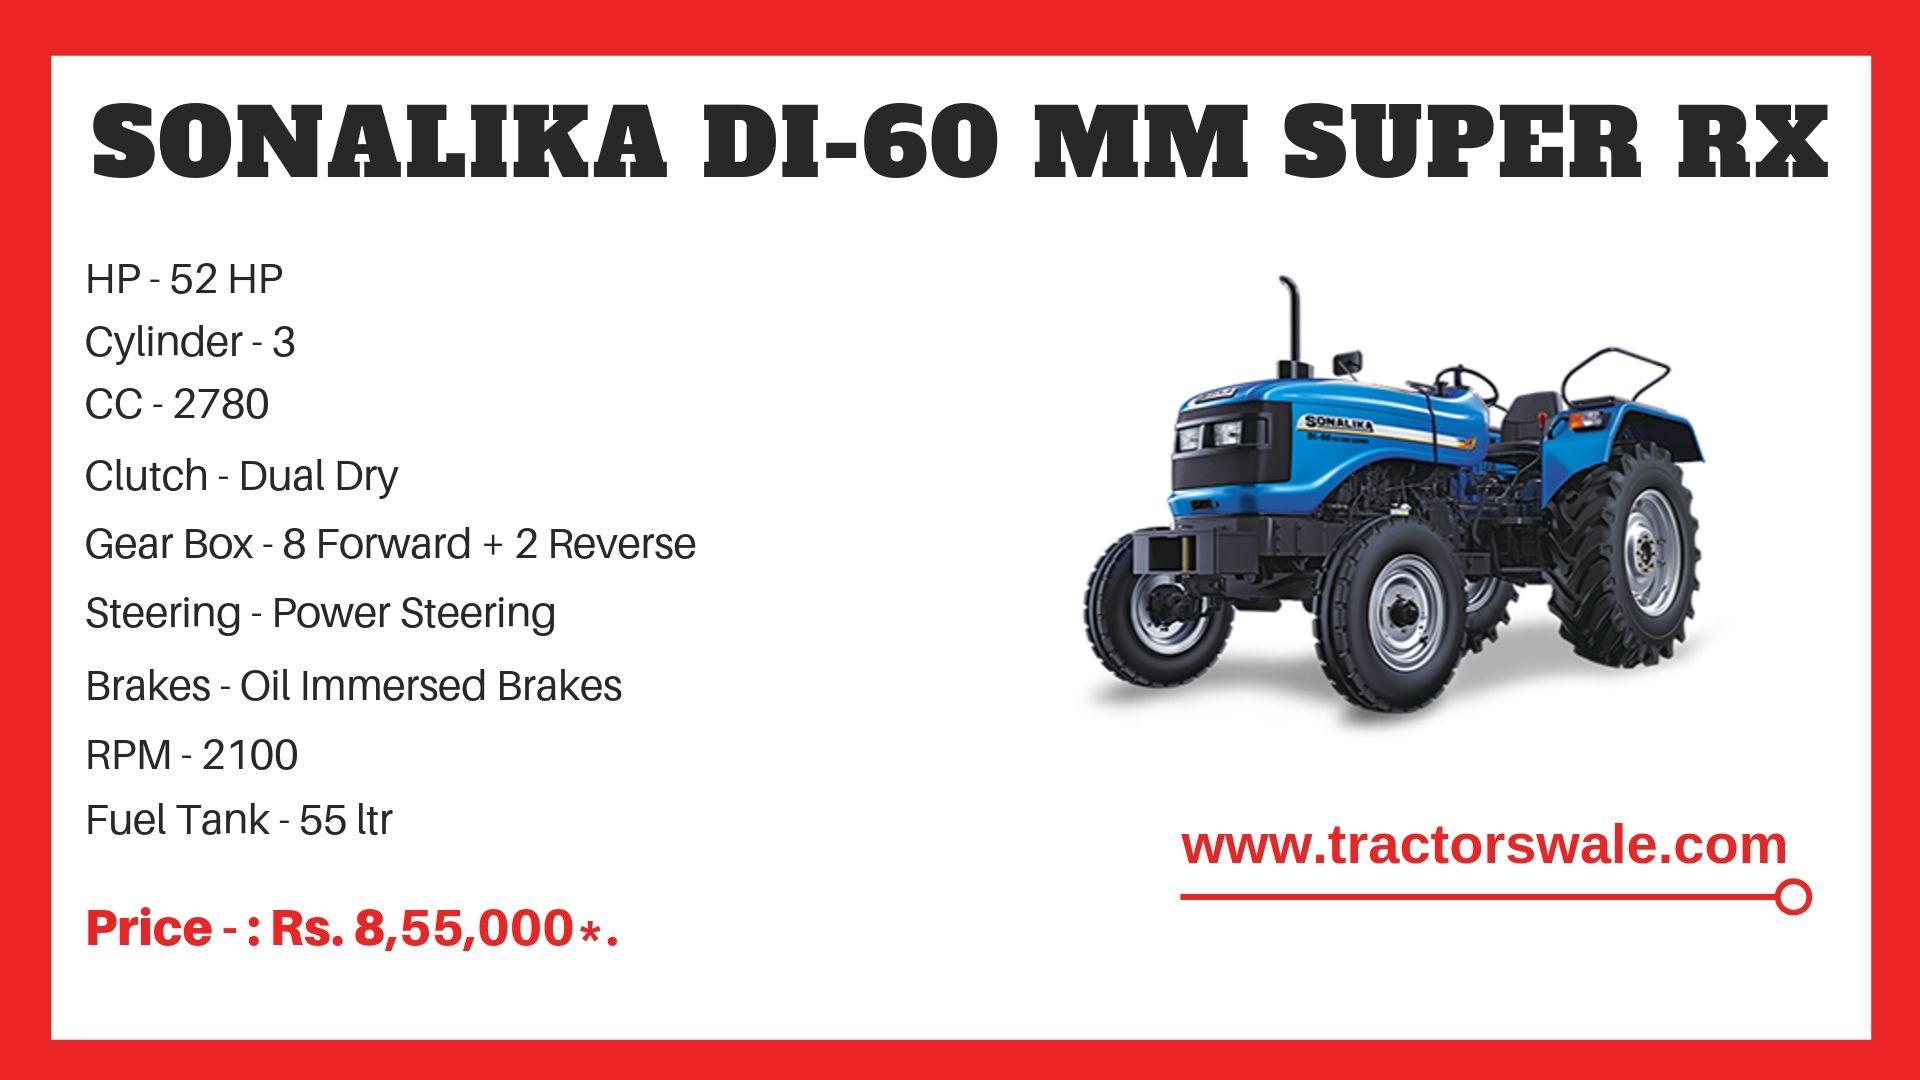 Sonalika DI 60 tractor specs